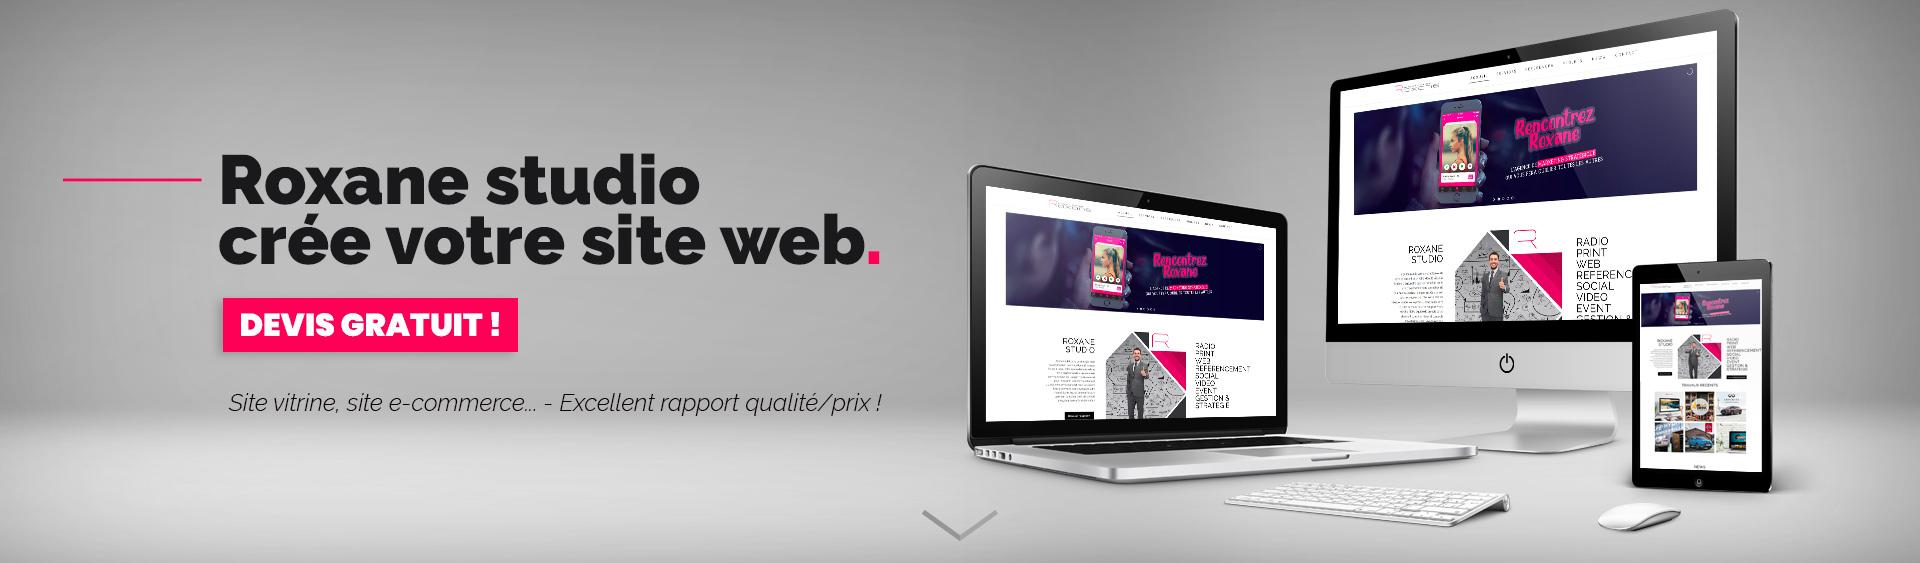 slider_roxane_promo_site_internet